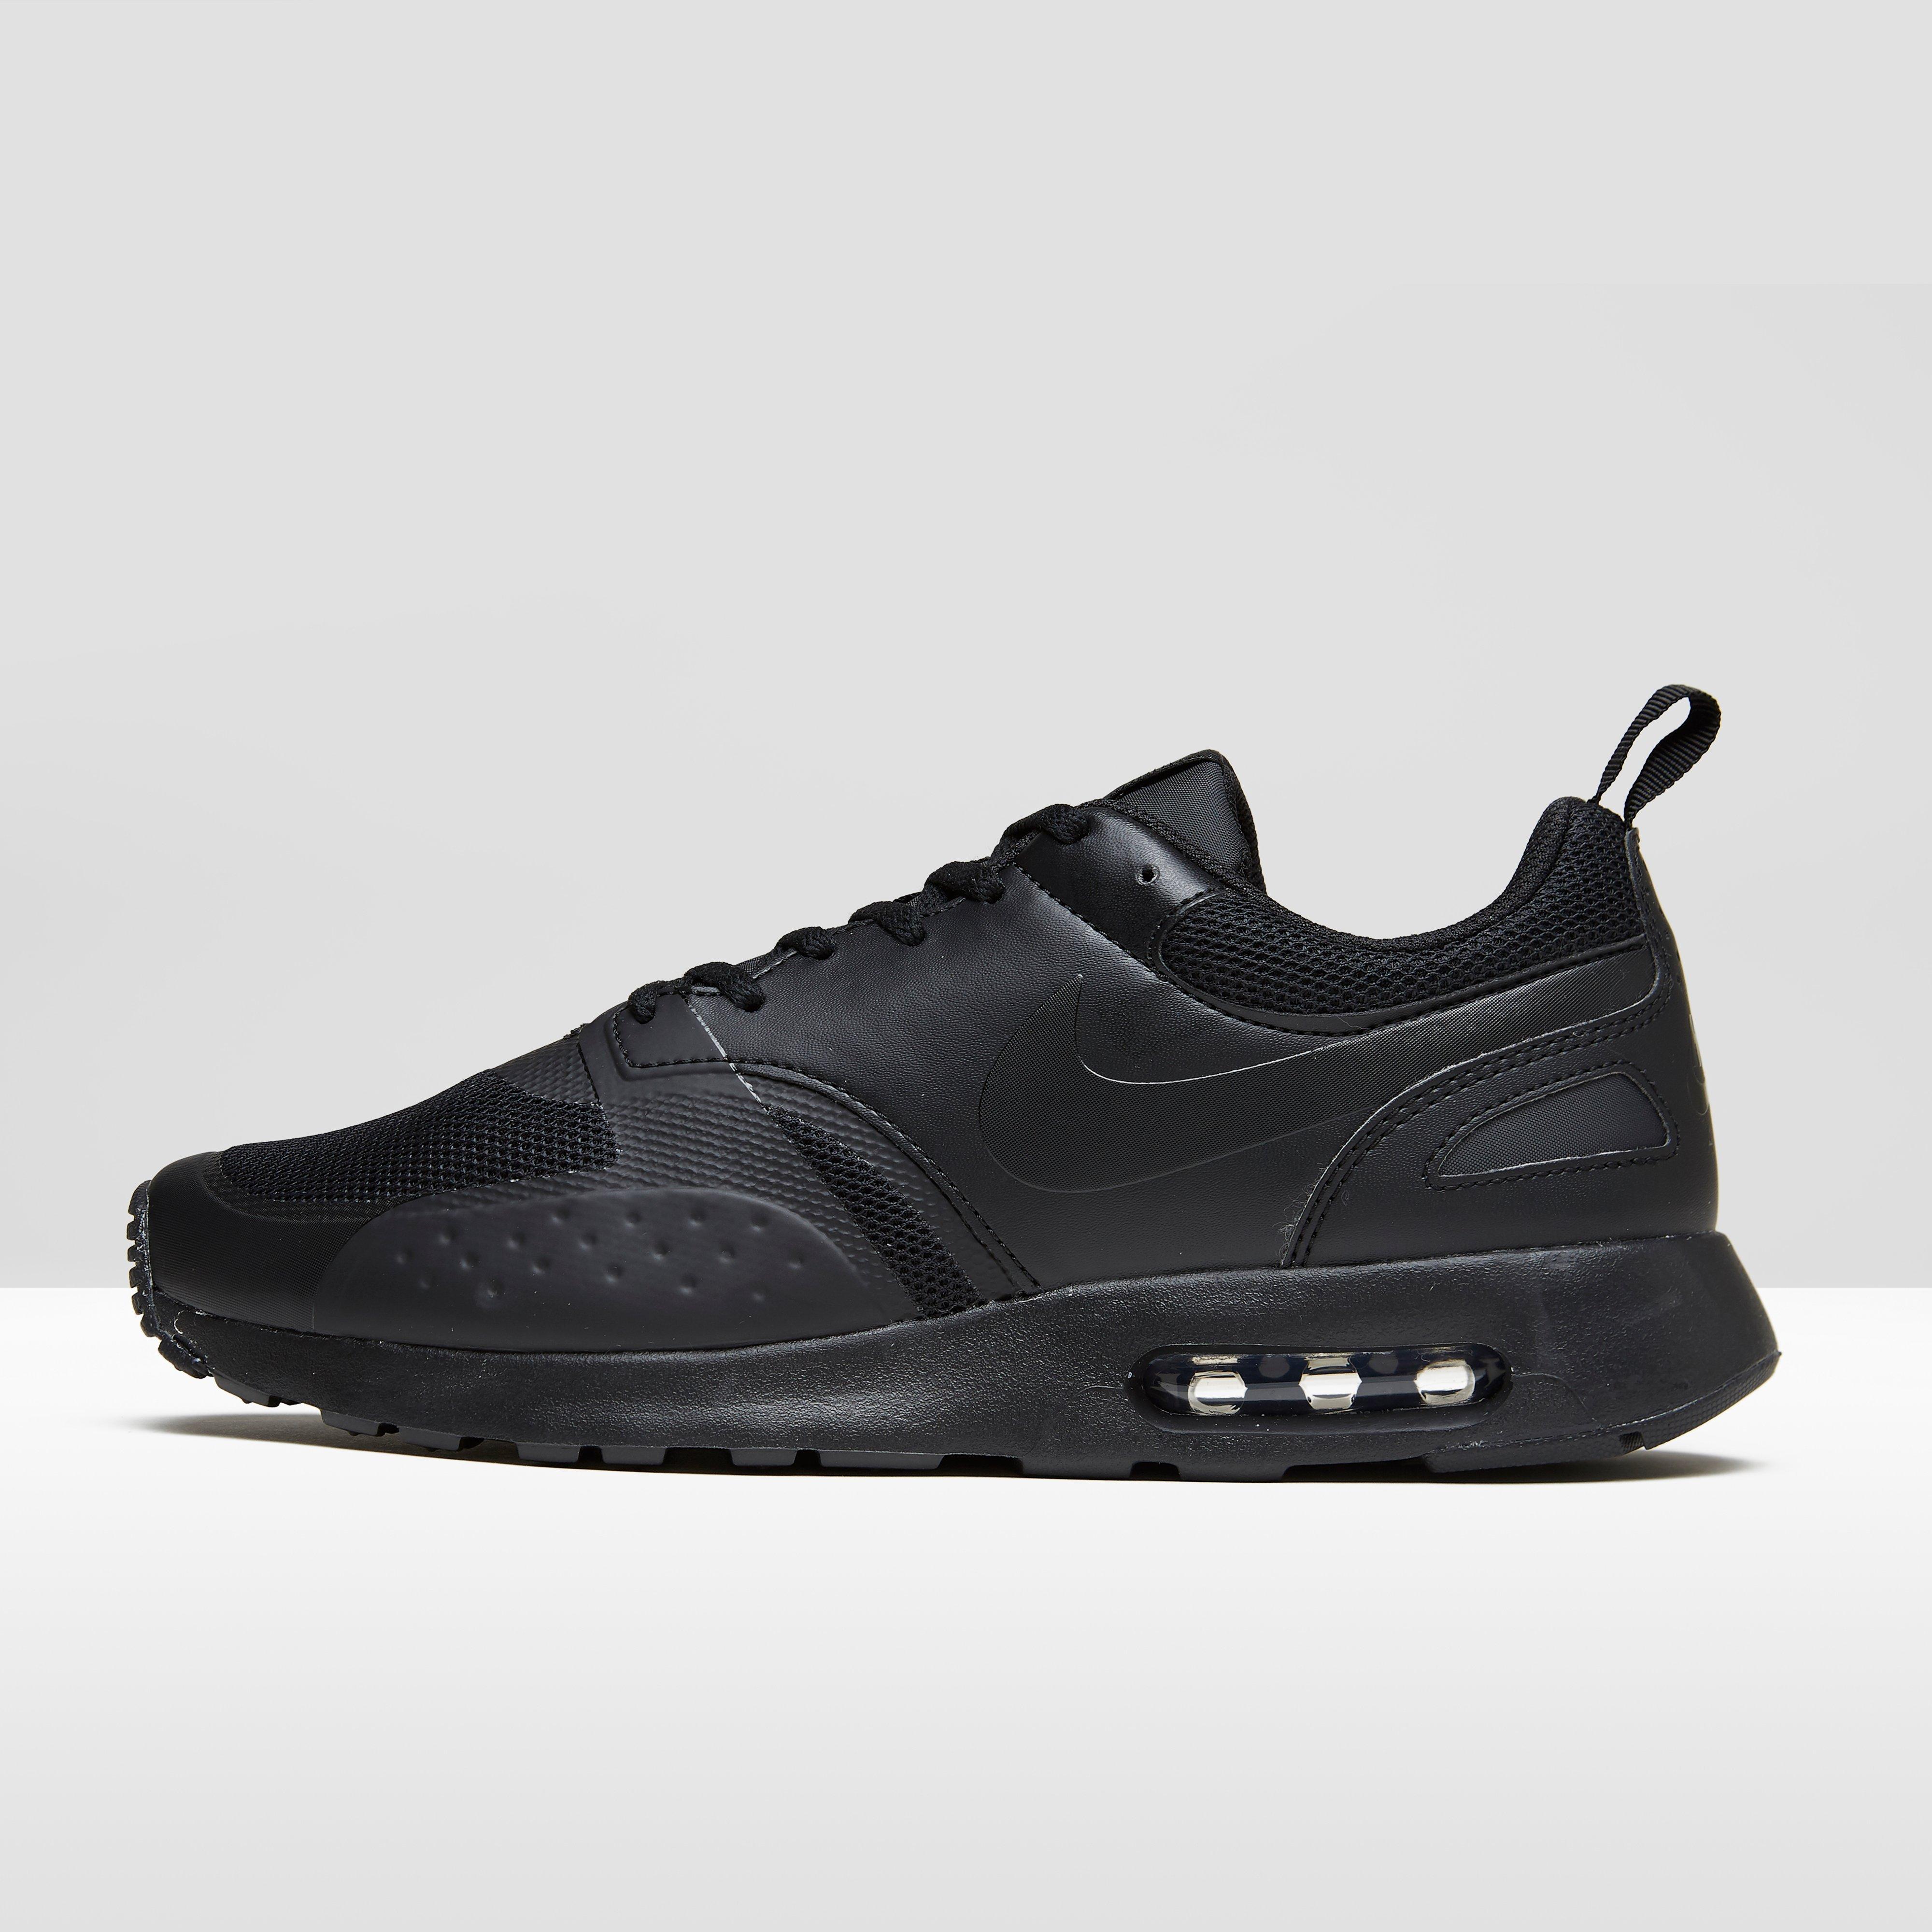 Chaussures Nike Air Max 47 Hommes Dans La Vision OXc1b9